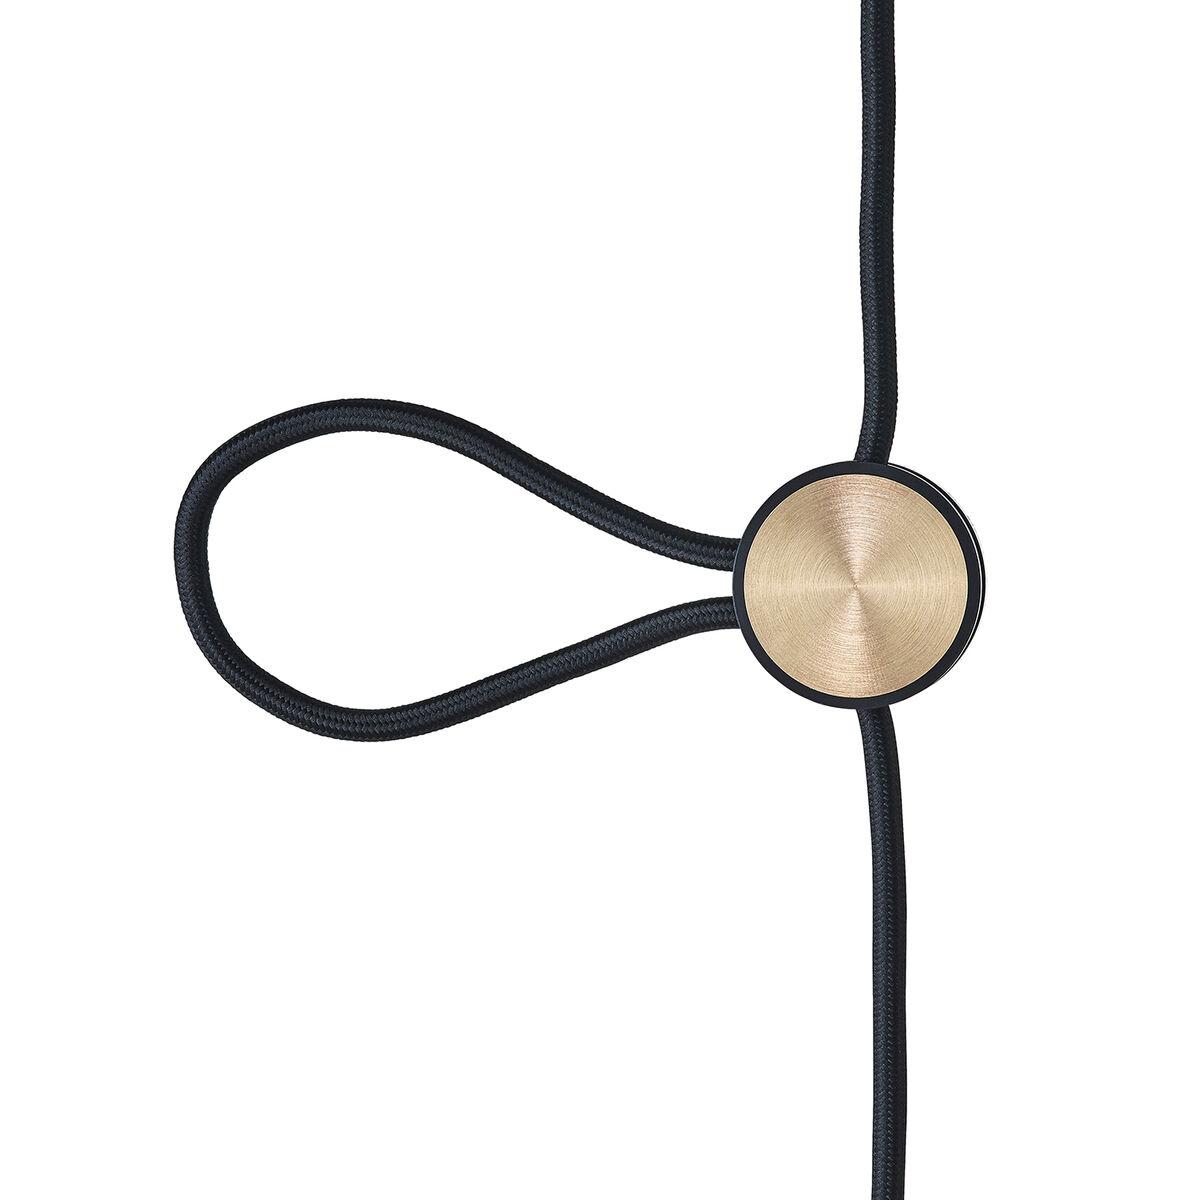 Le Klint Cord Adjuster korkeudensäädin, musta - messinki